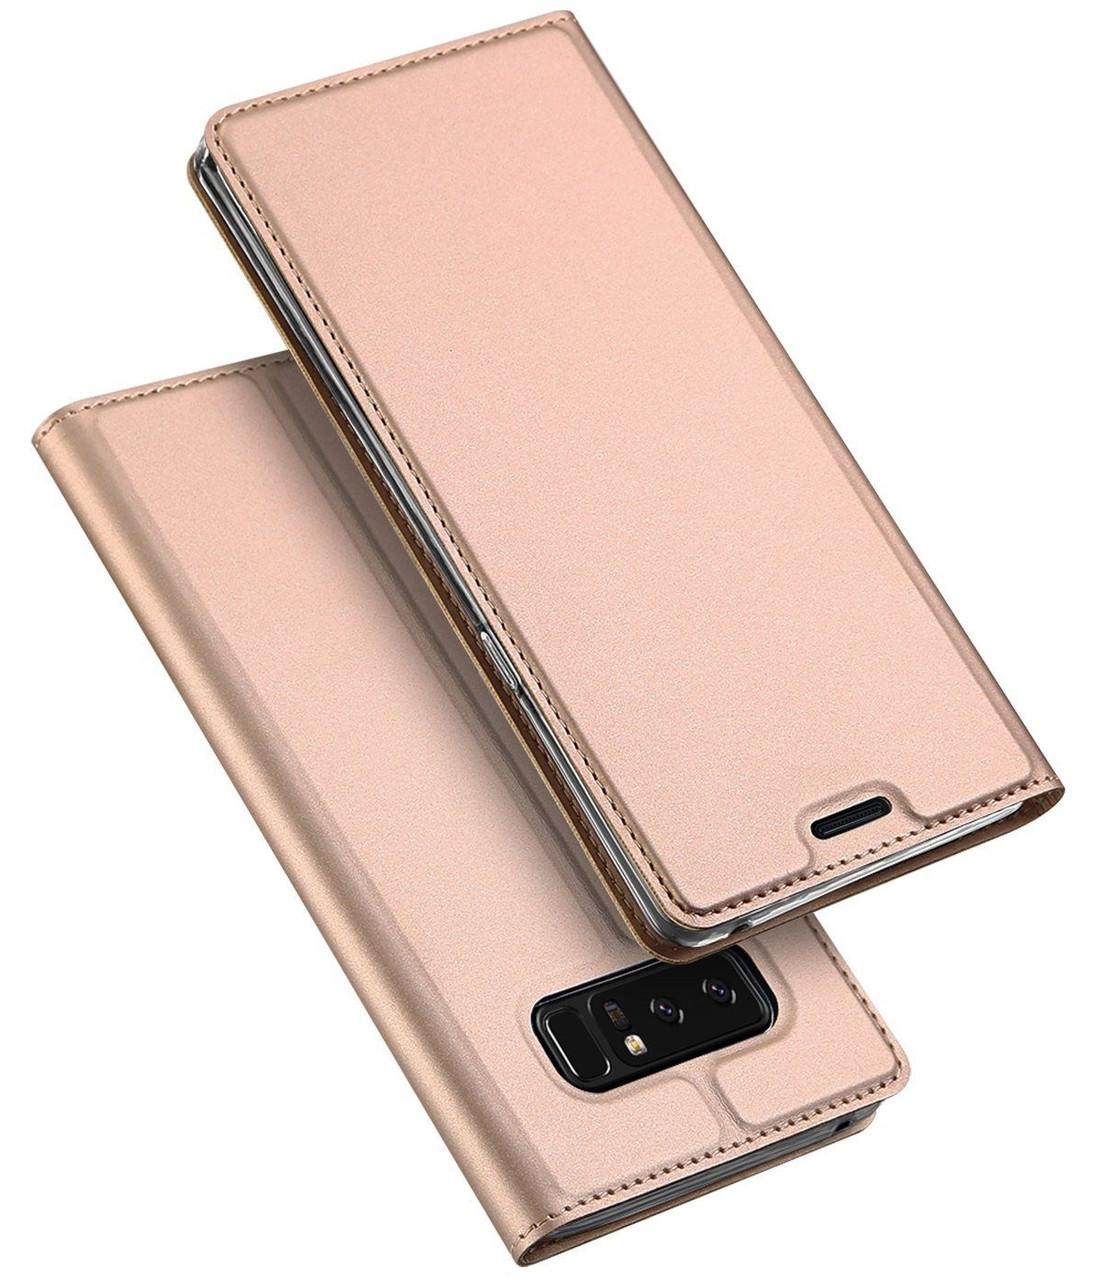 newest 9a02b a4b76 Samsung Galaxy Note 8 Case Rose Gold